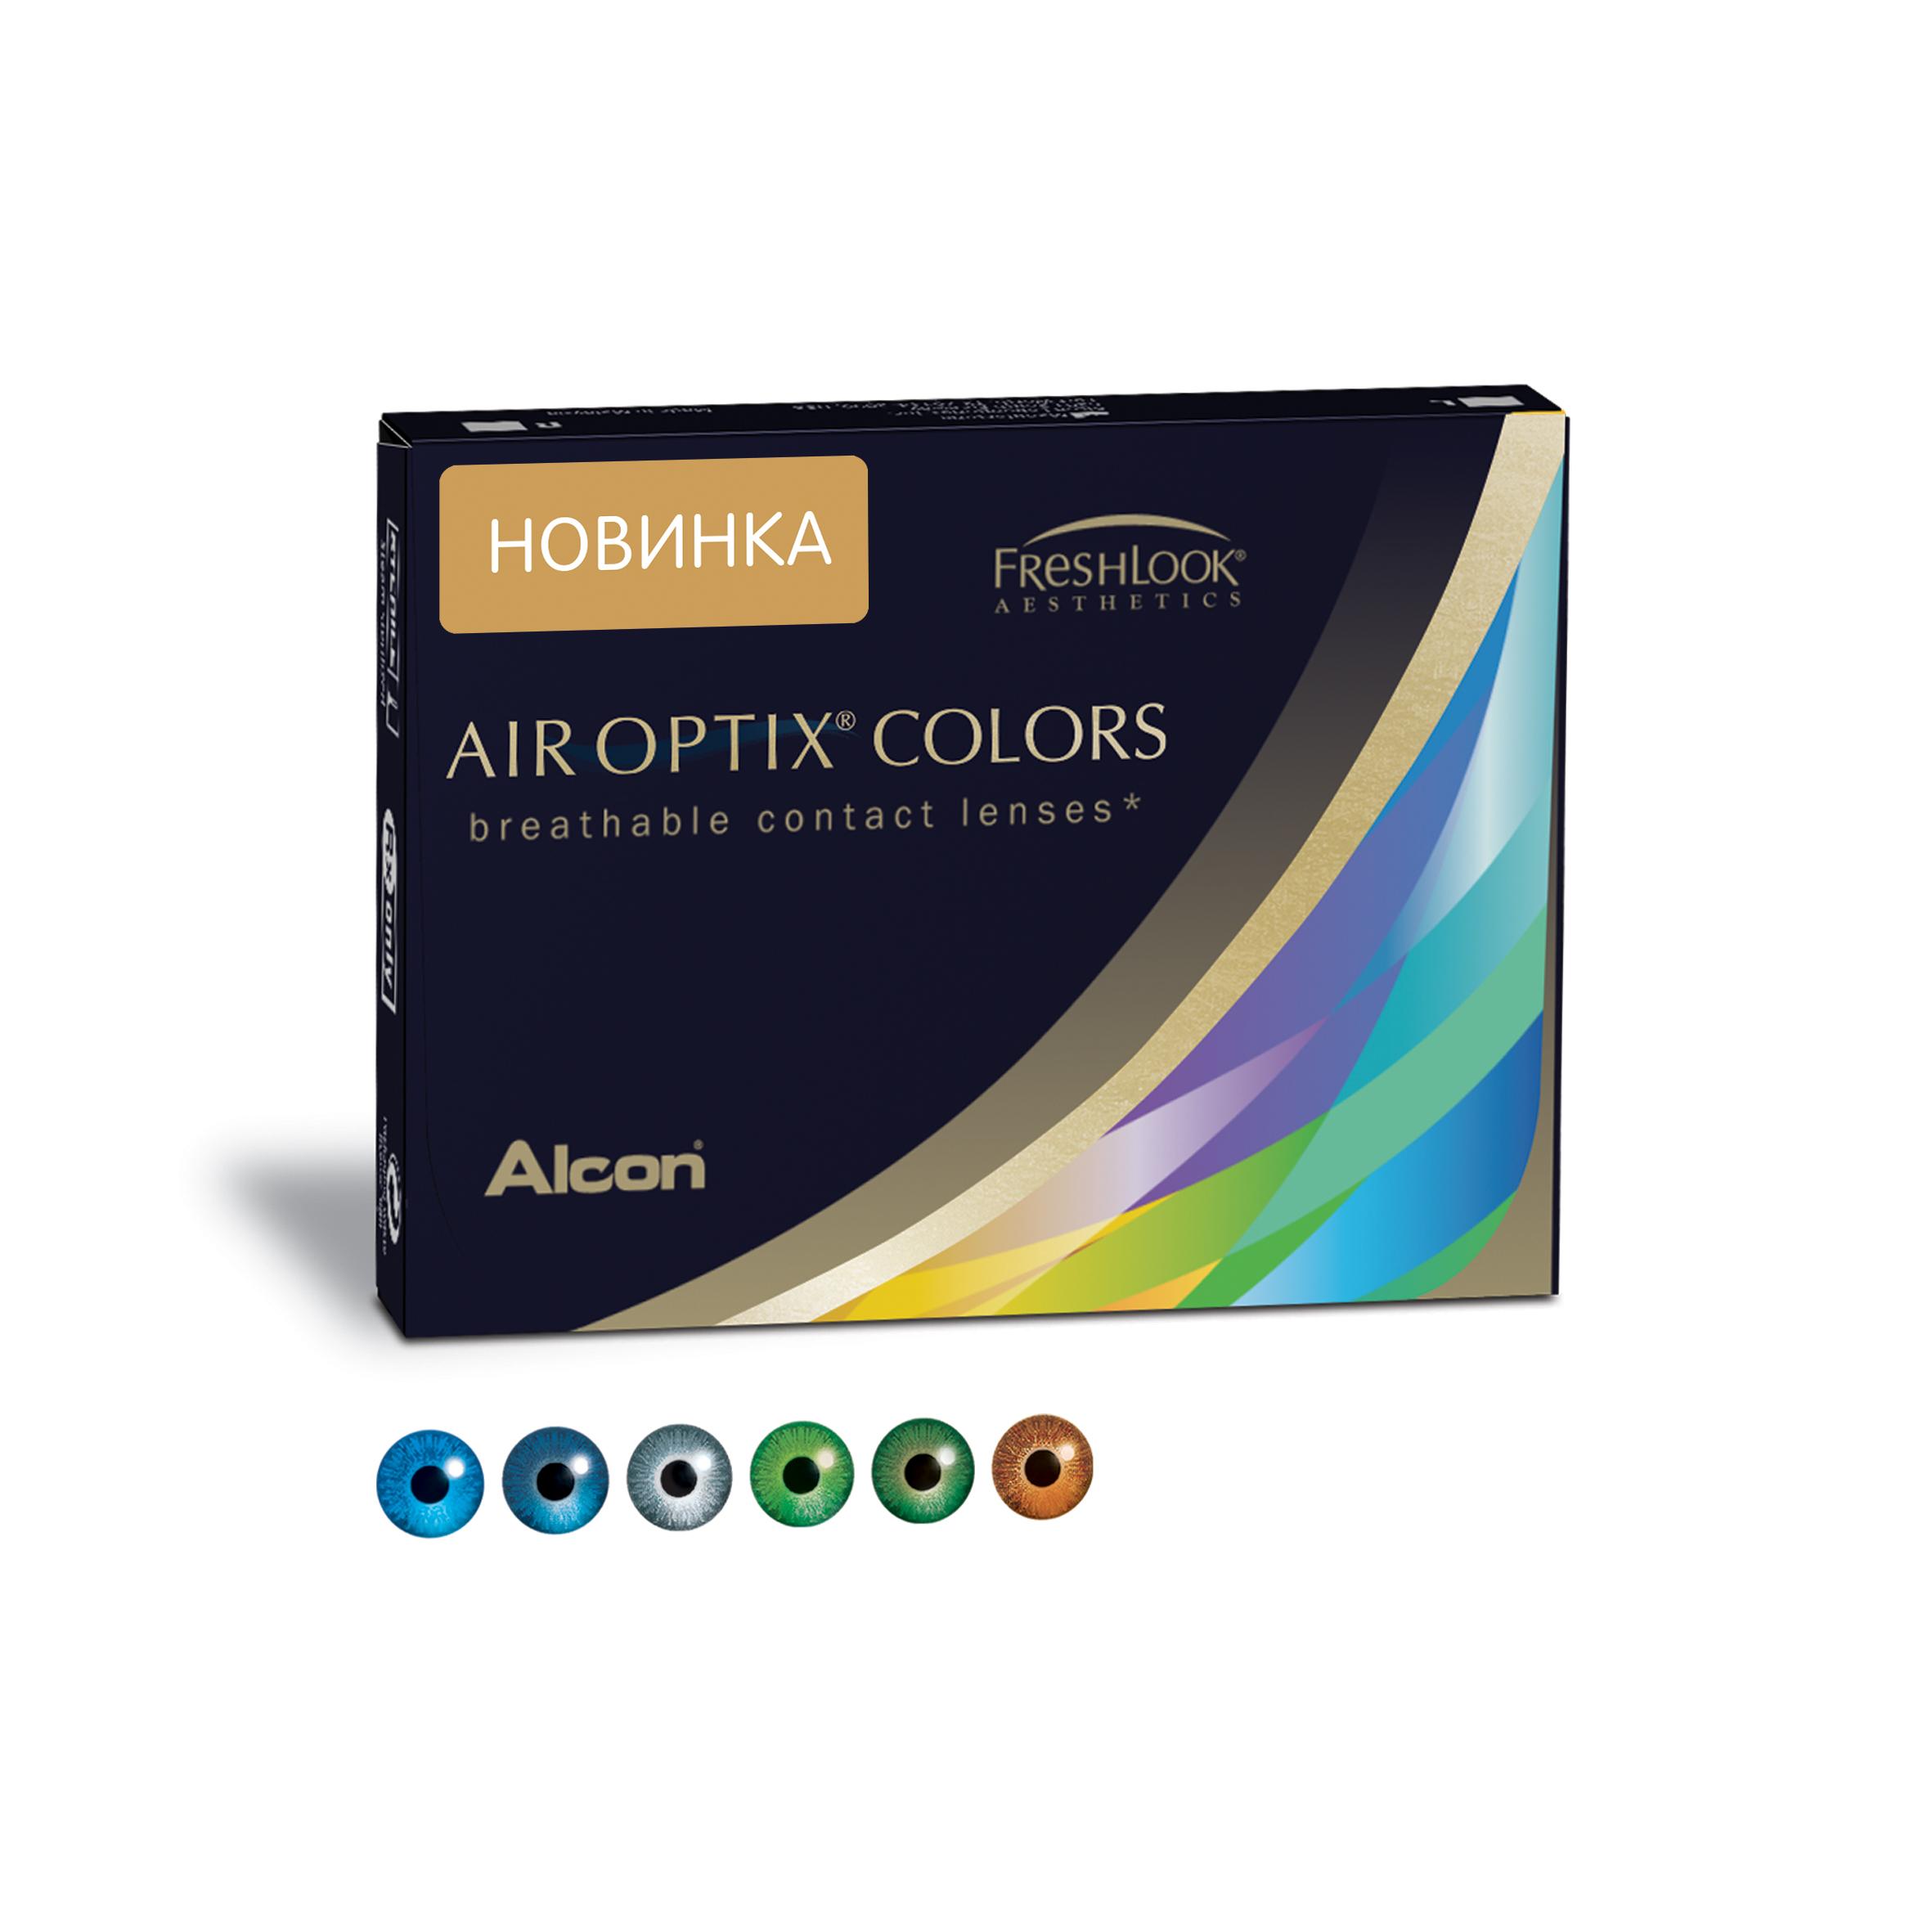 Аlcon контактные линзы Air Optix Colors 2 шт -1.25 Honey31746136Мягкие контактные линзы